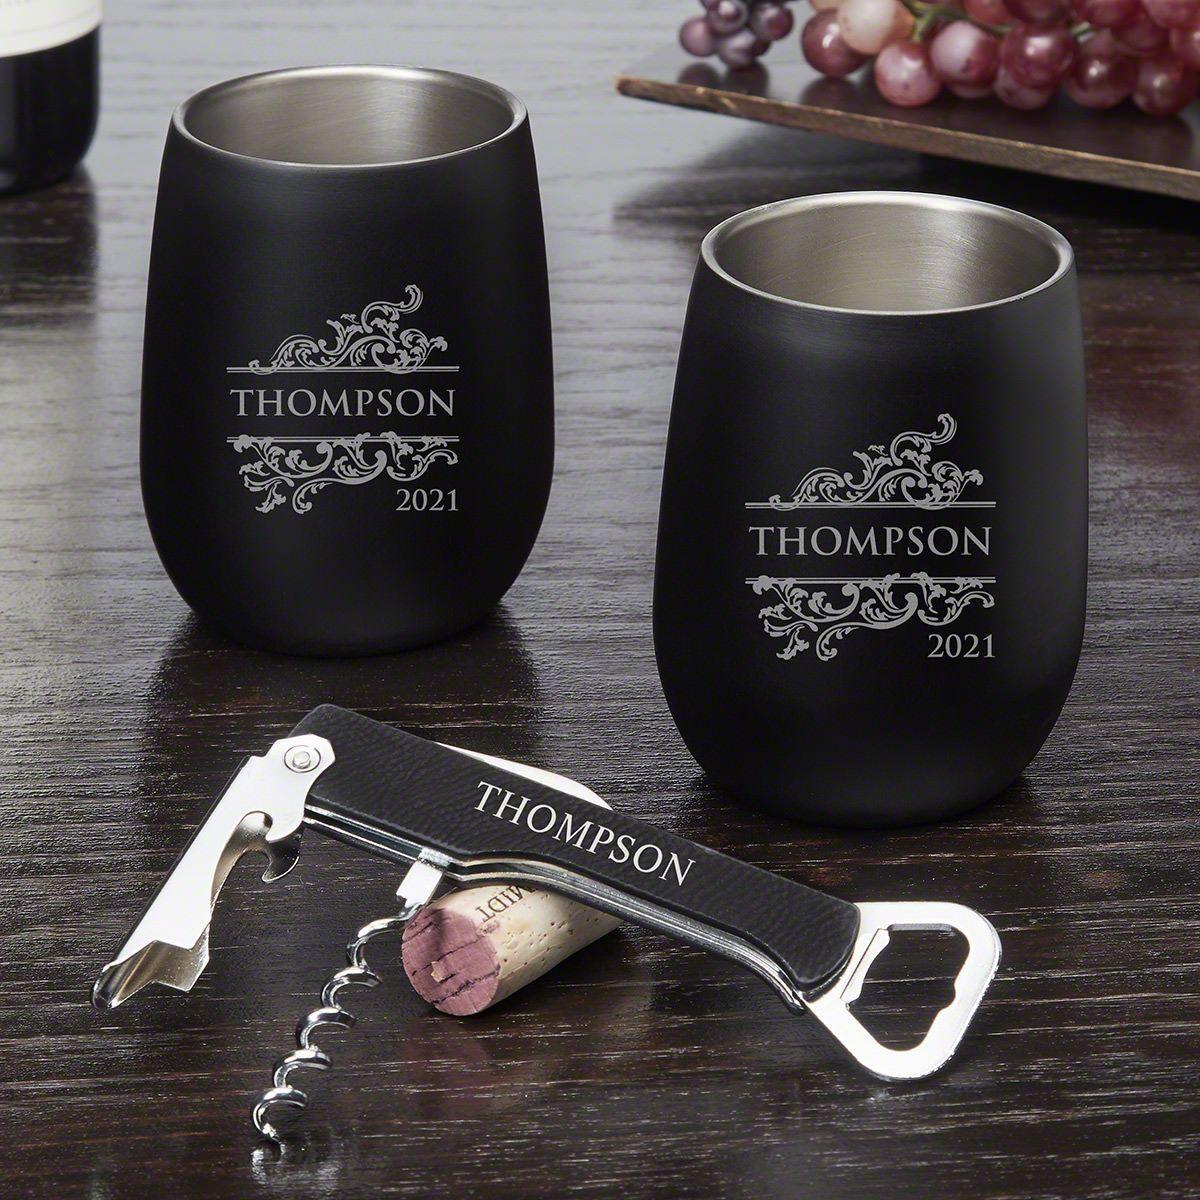 Livingston Personalized Wine Tumbler Gift Set